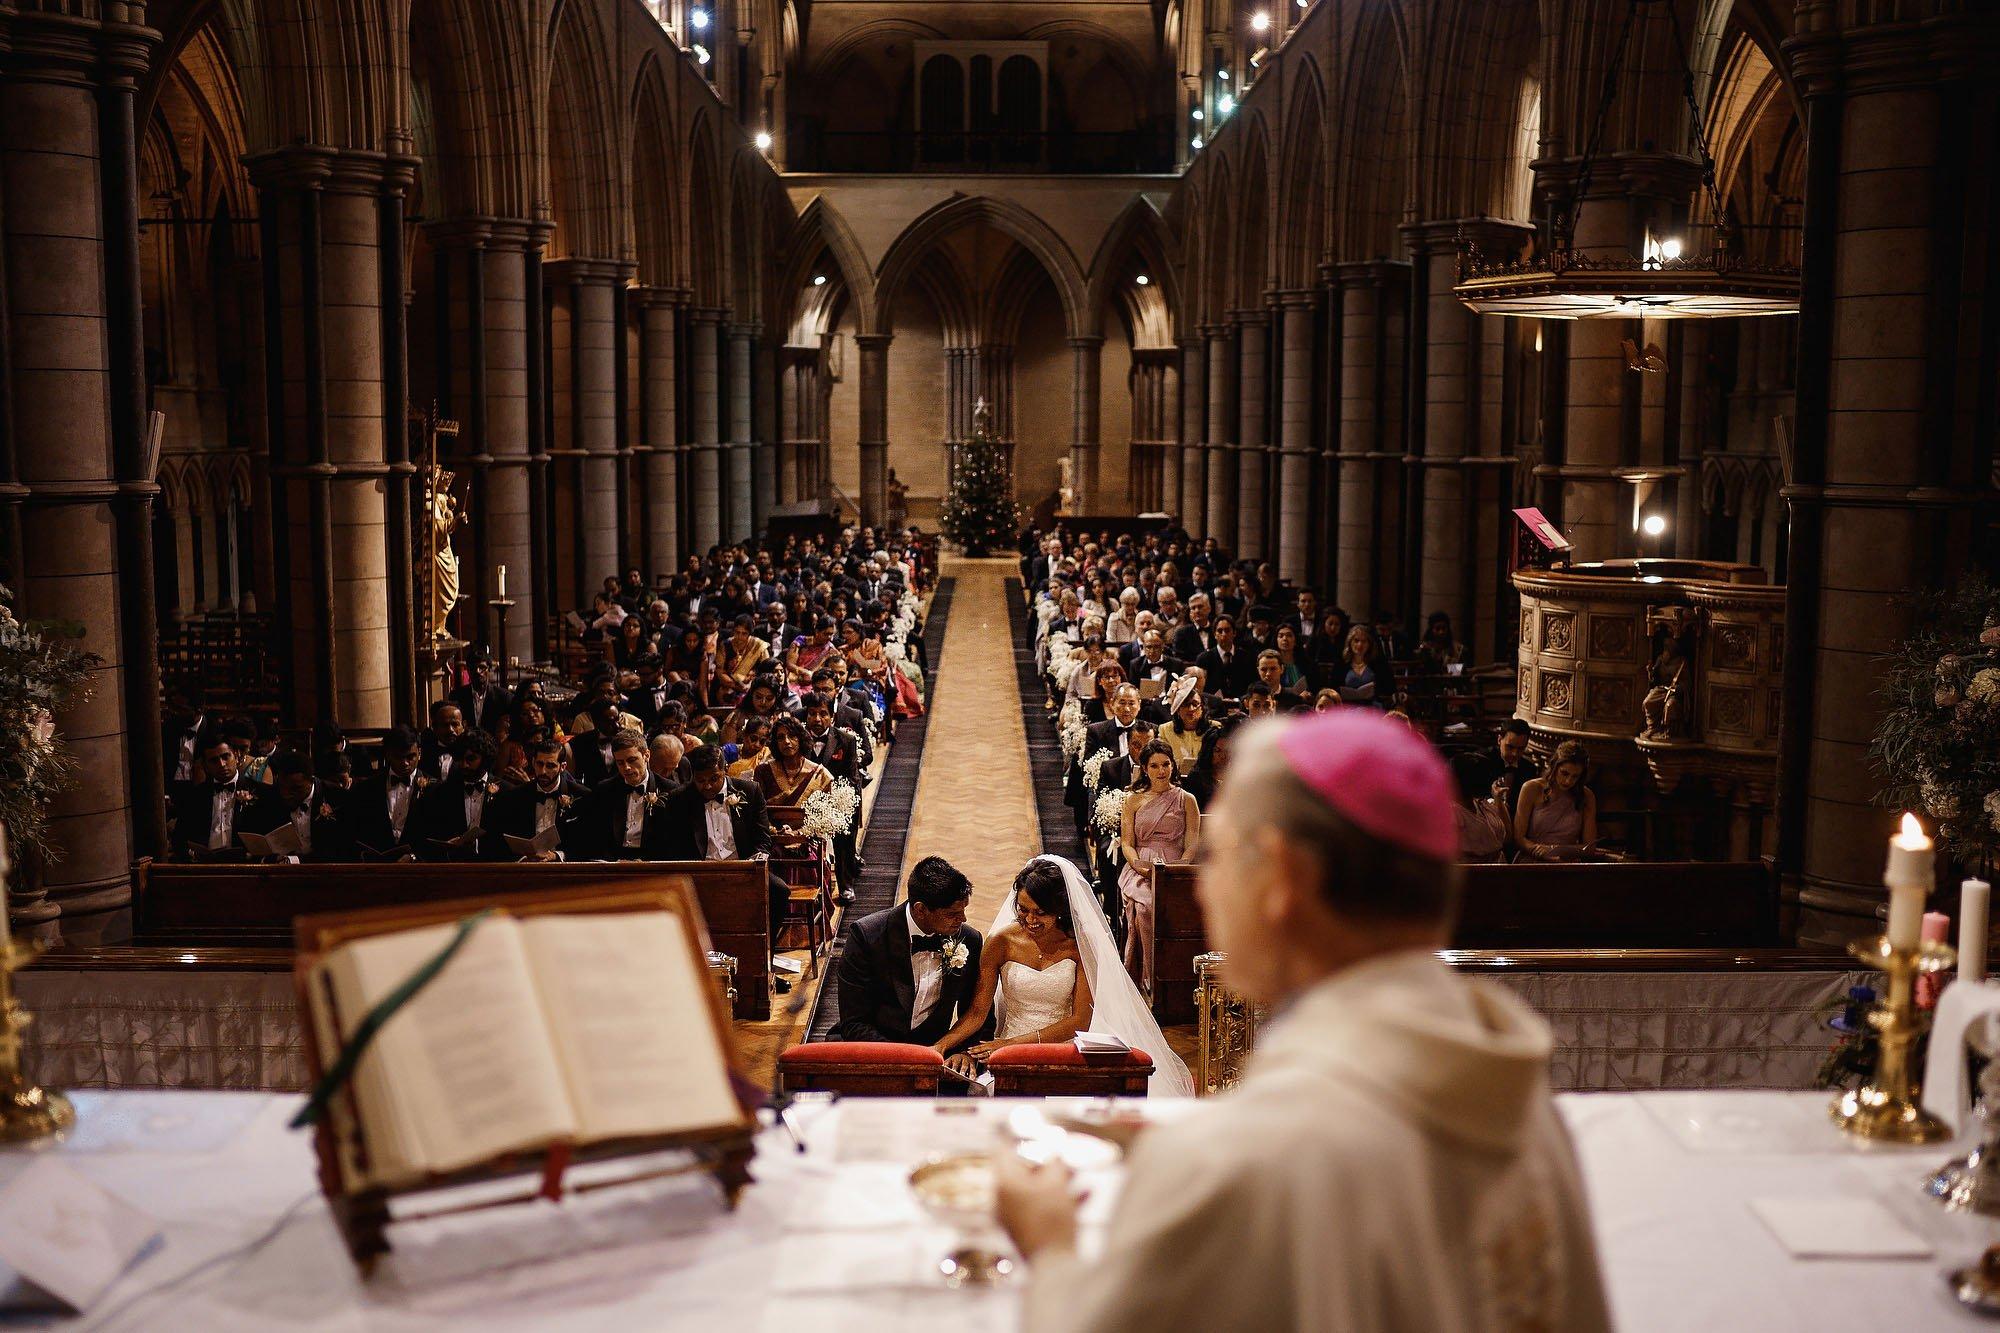 Landmark london marylebone catholic church st james - arj photography®